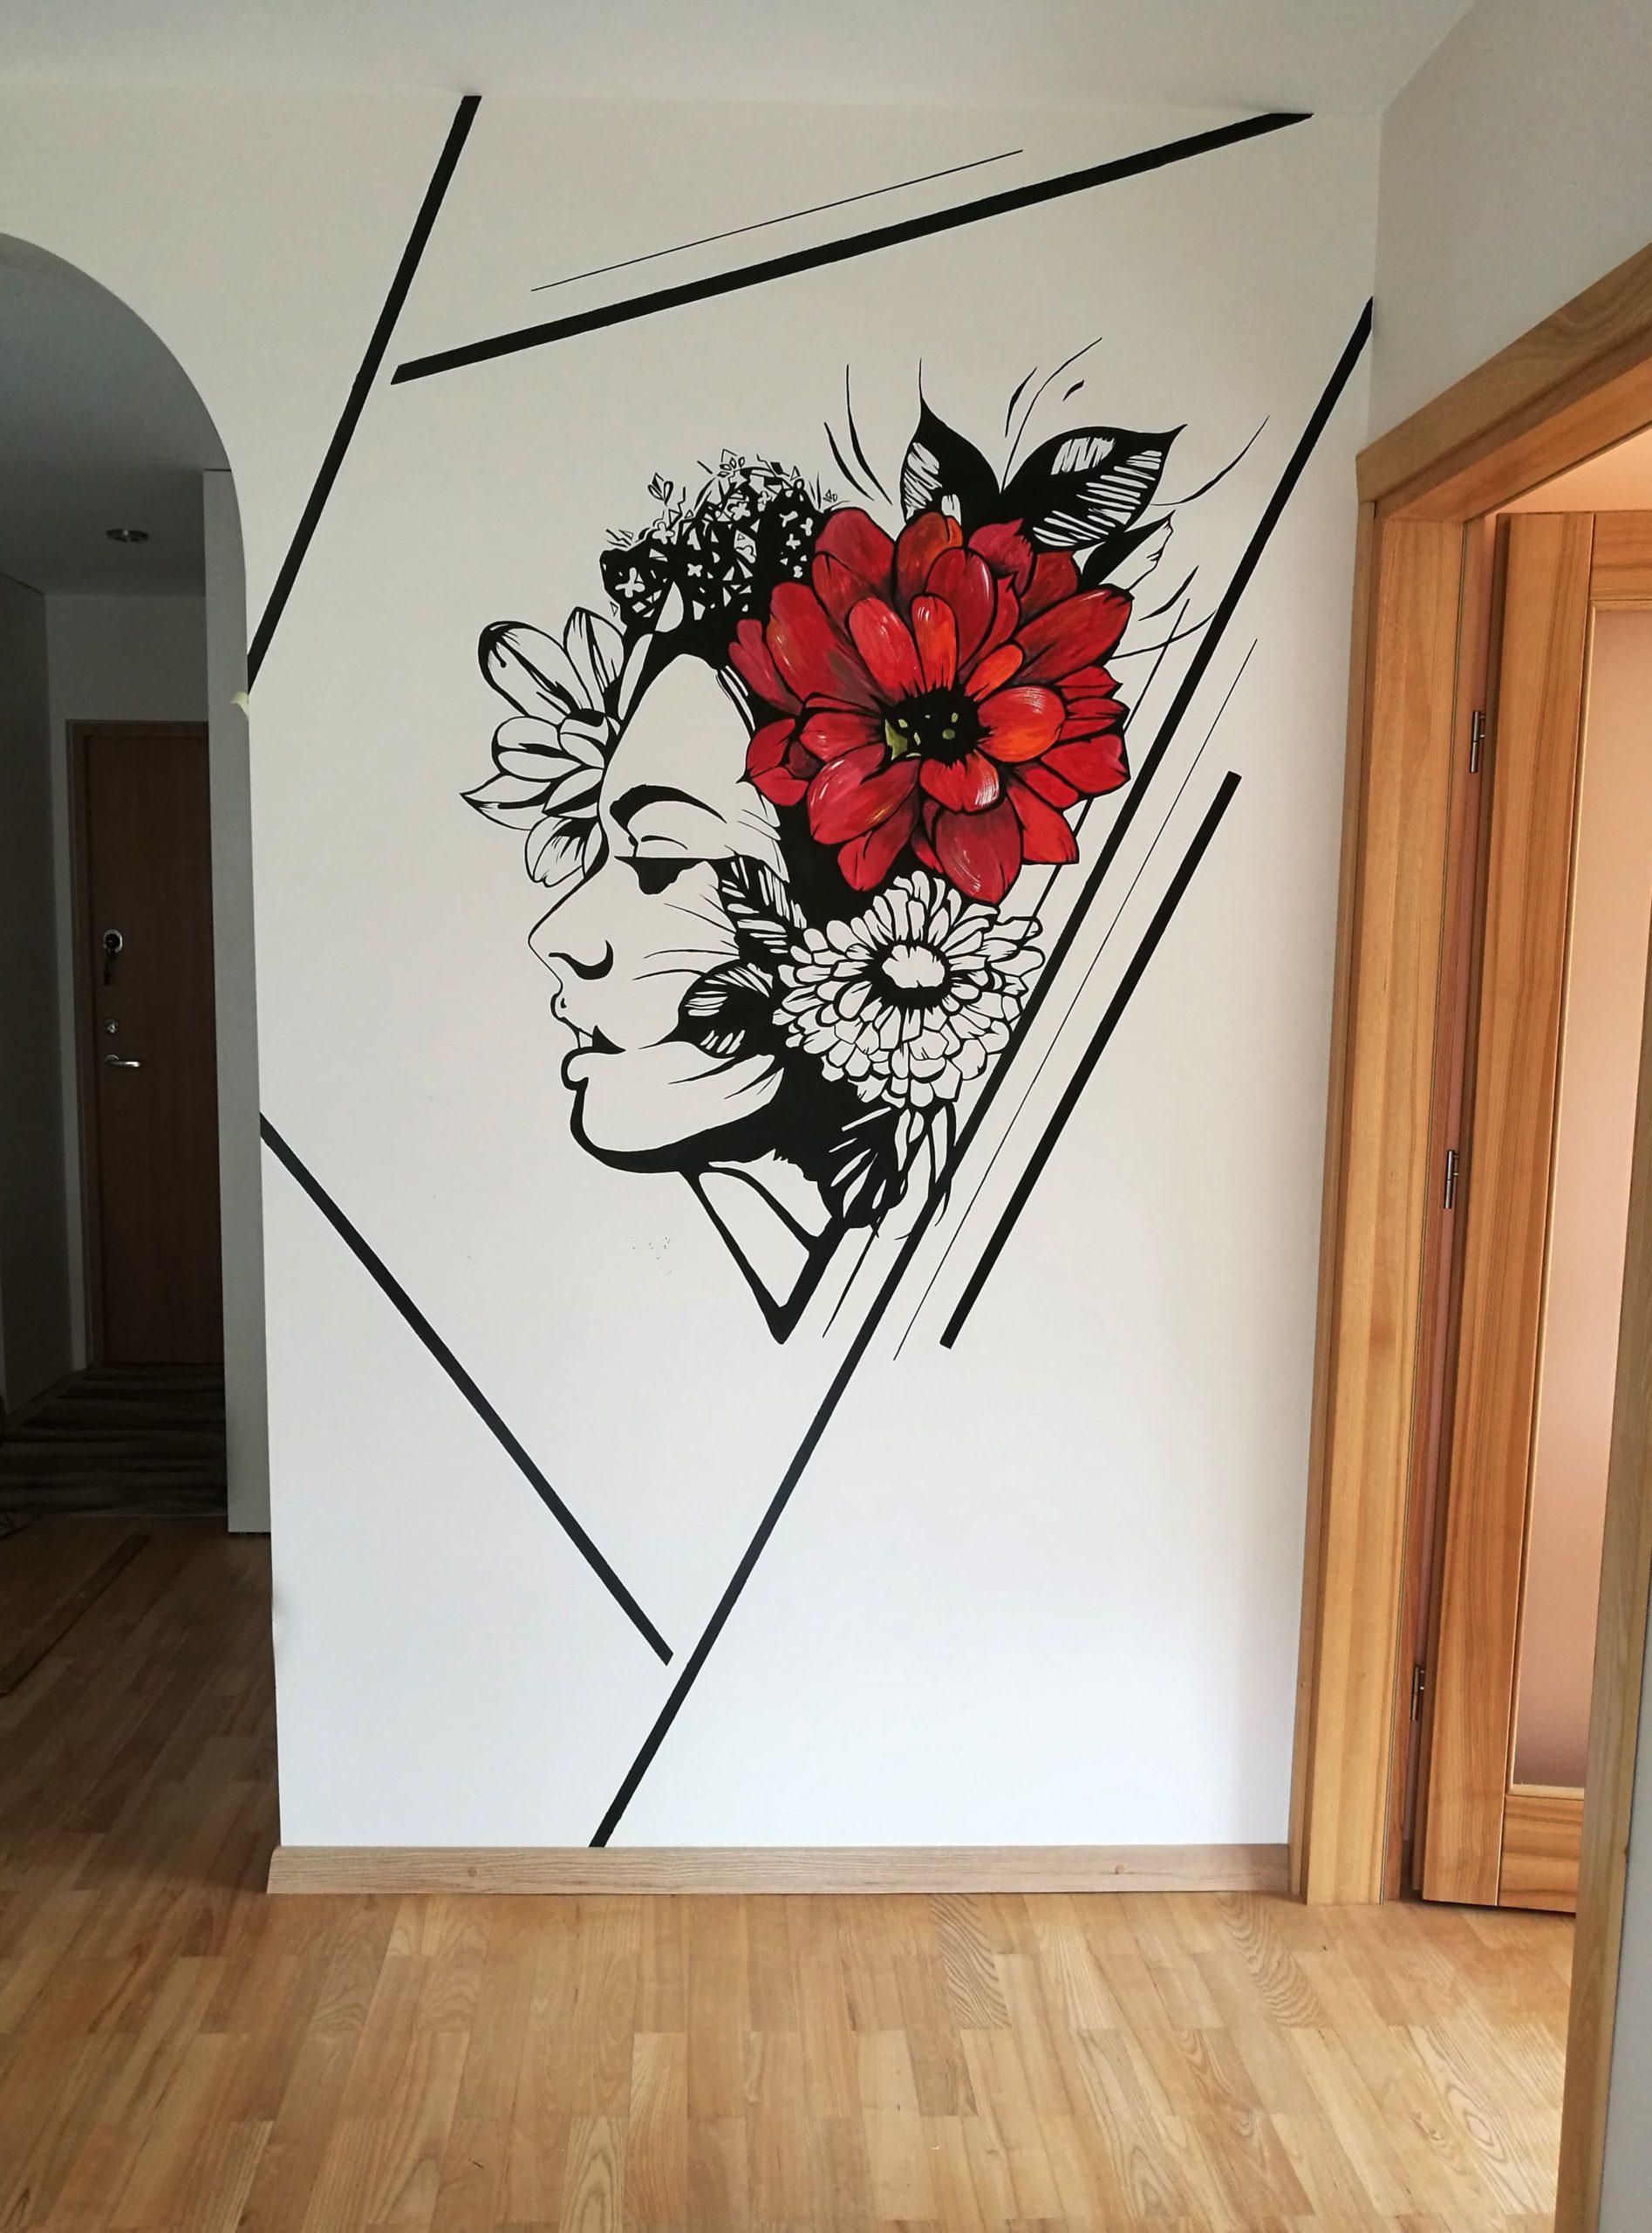 menine-kuryba-sienu-dekoravimas-ivairus-interjerai (10)